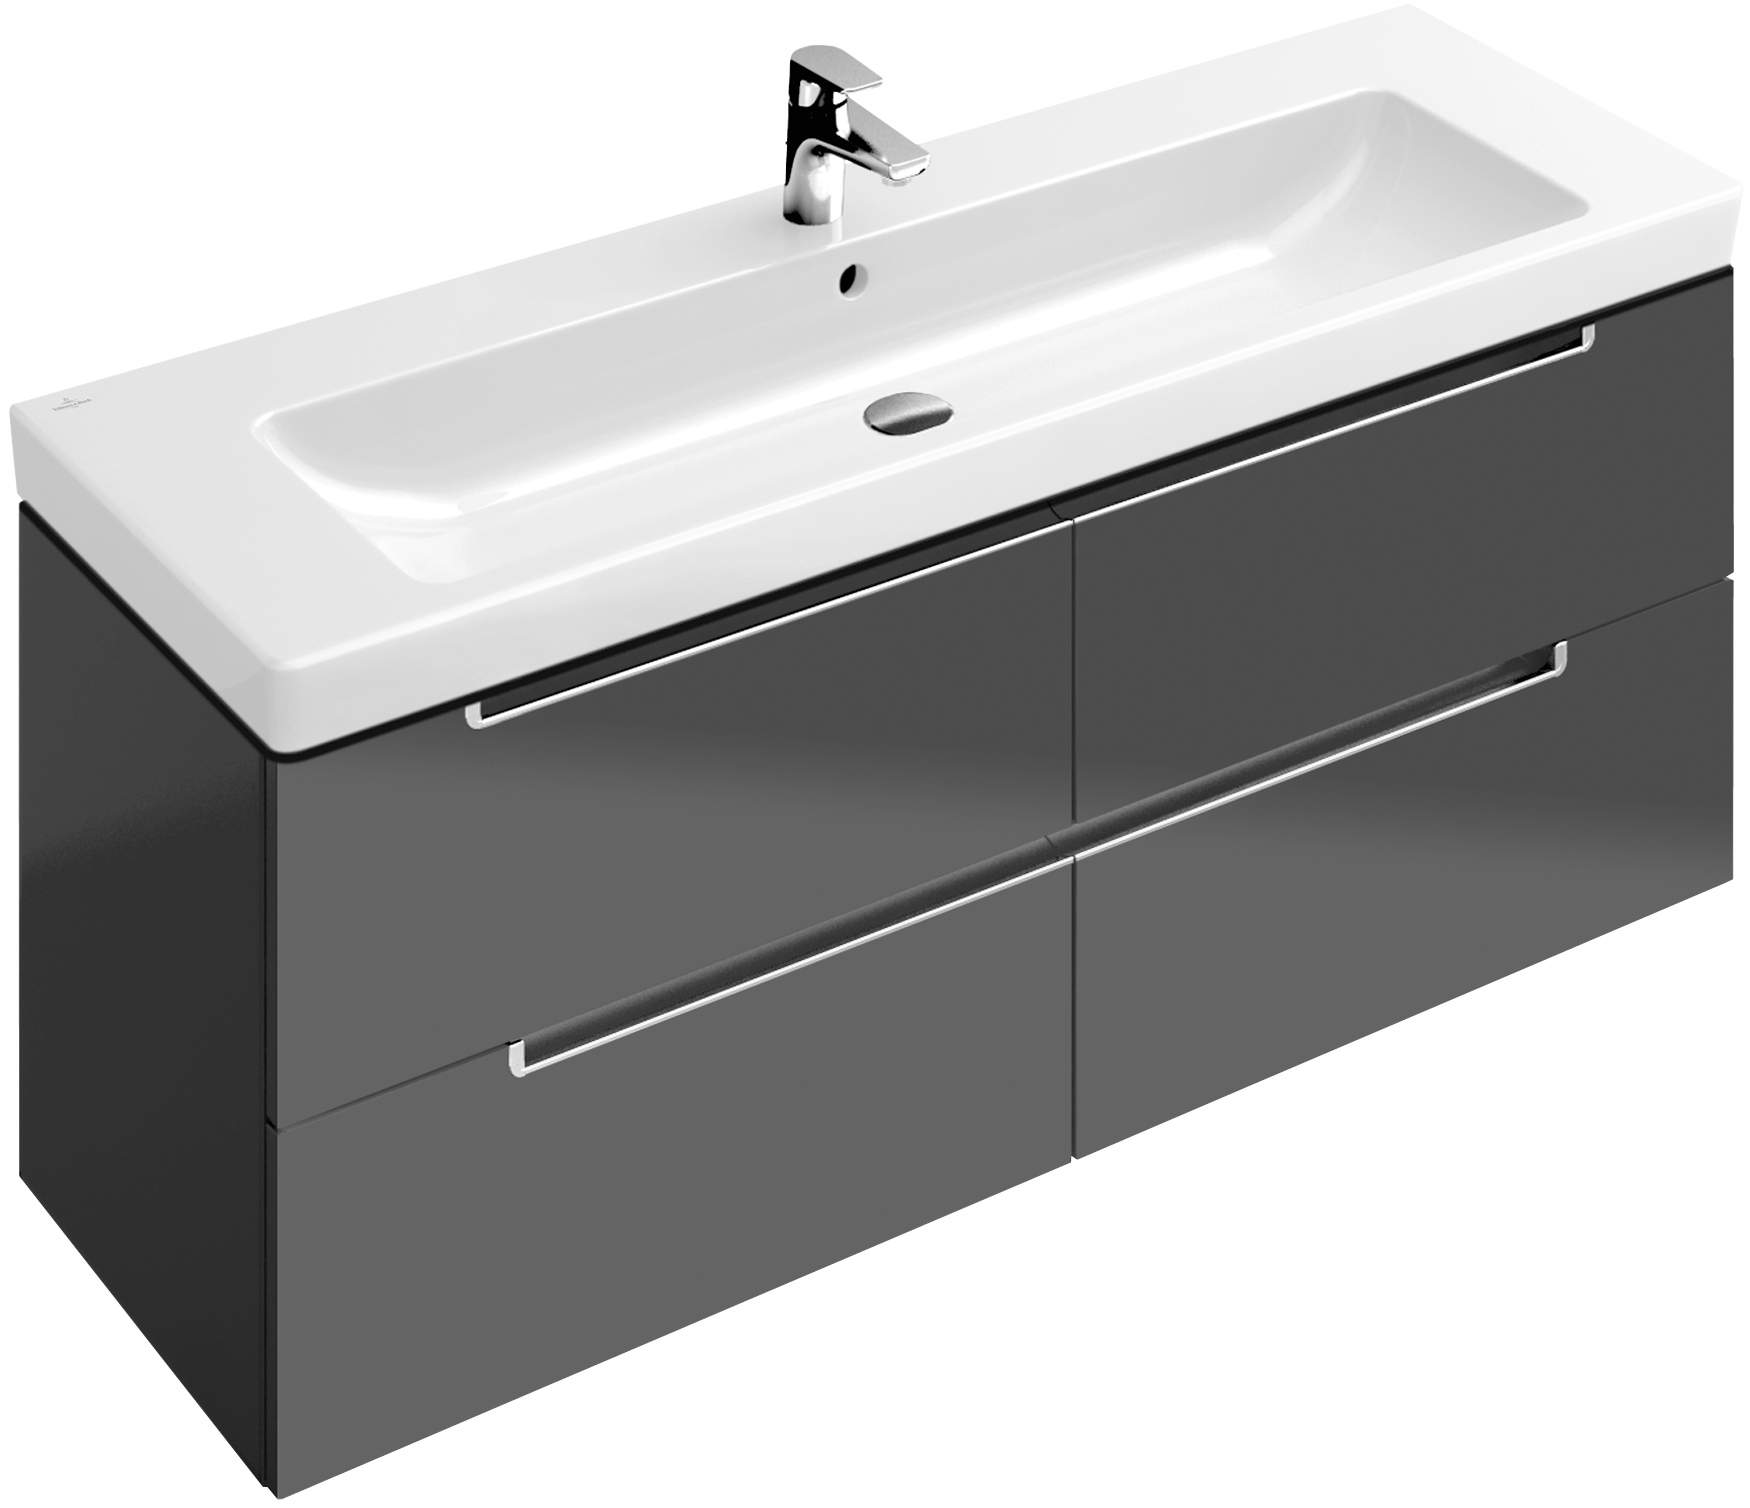 Superieur Subway 2.0 Bathroom Furniture, Vanity Unit For Washbasin, Bathroom Sink  Cabinets